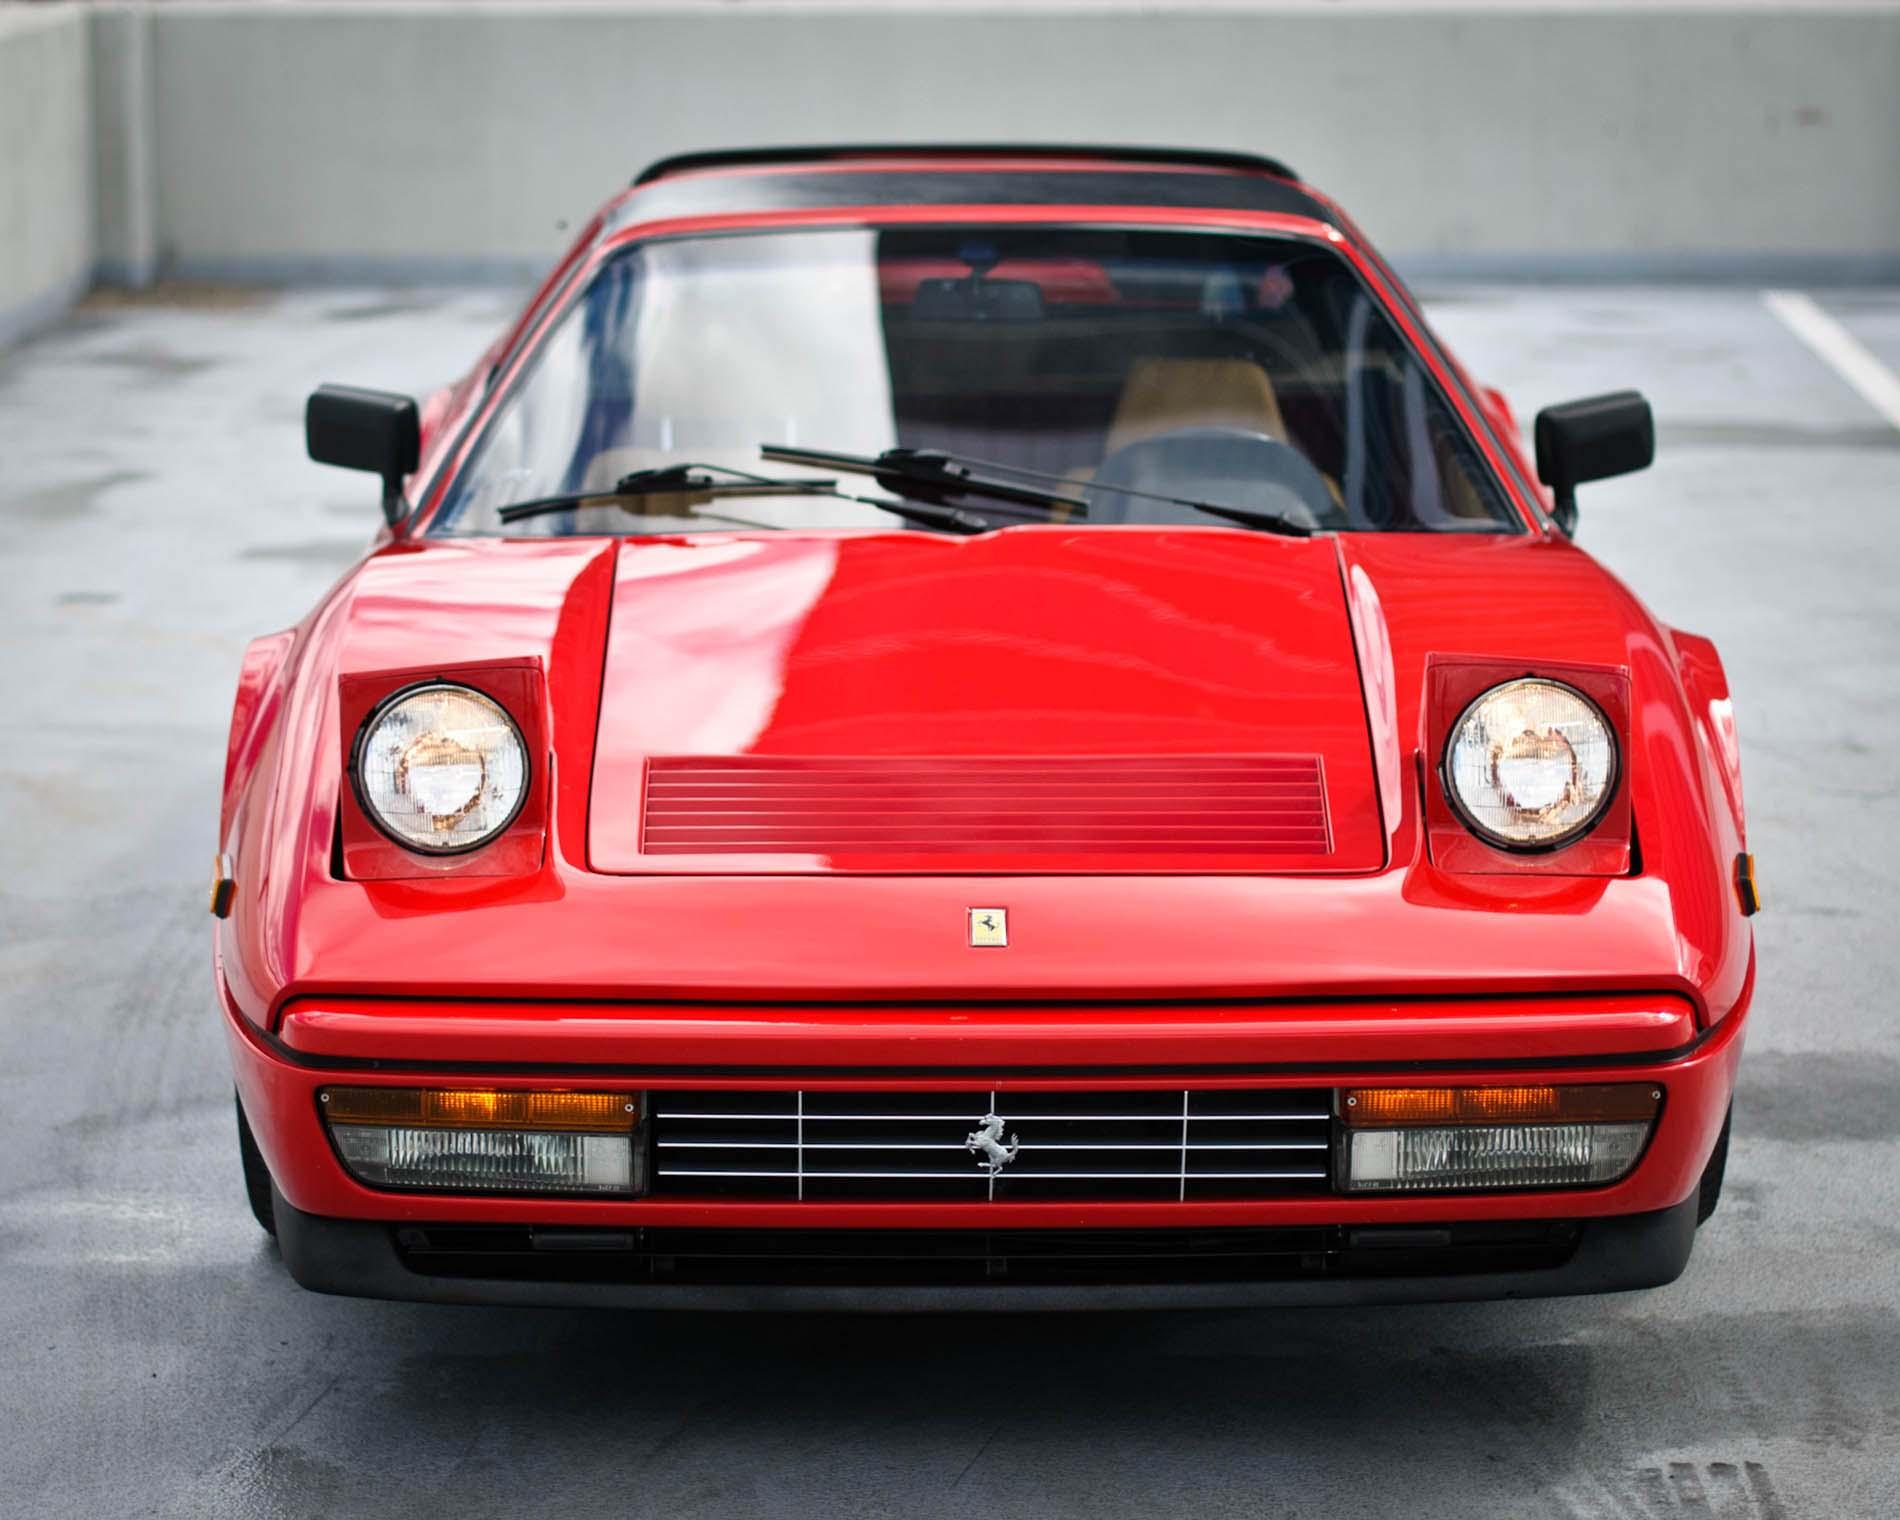 Ferrari 328 GTS in Kelowna